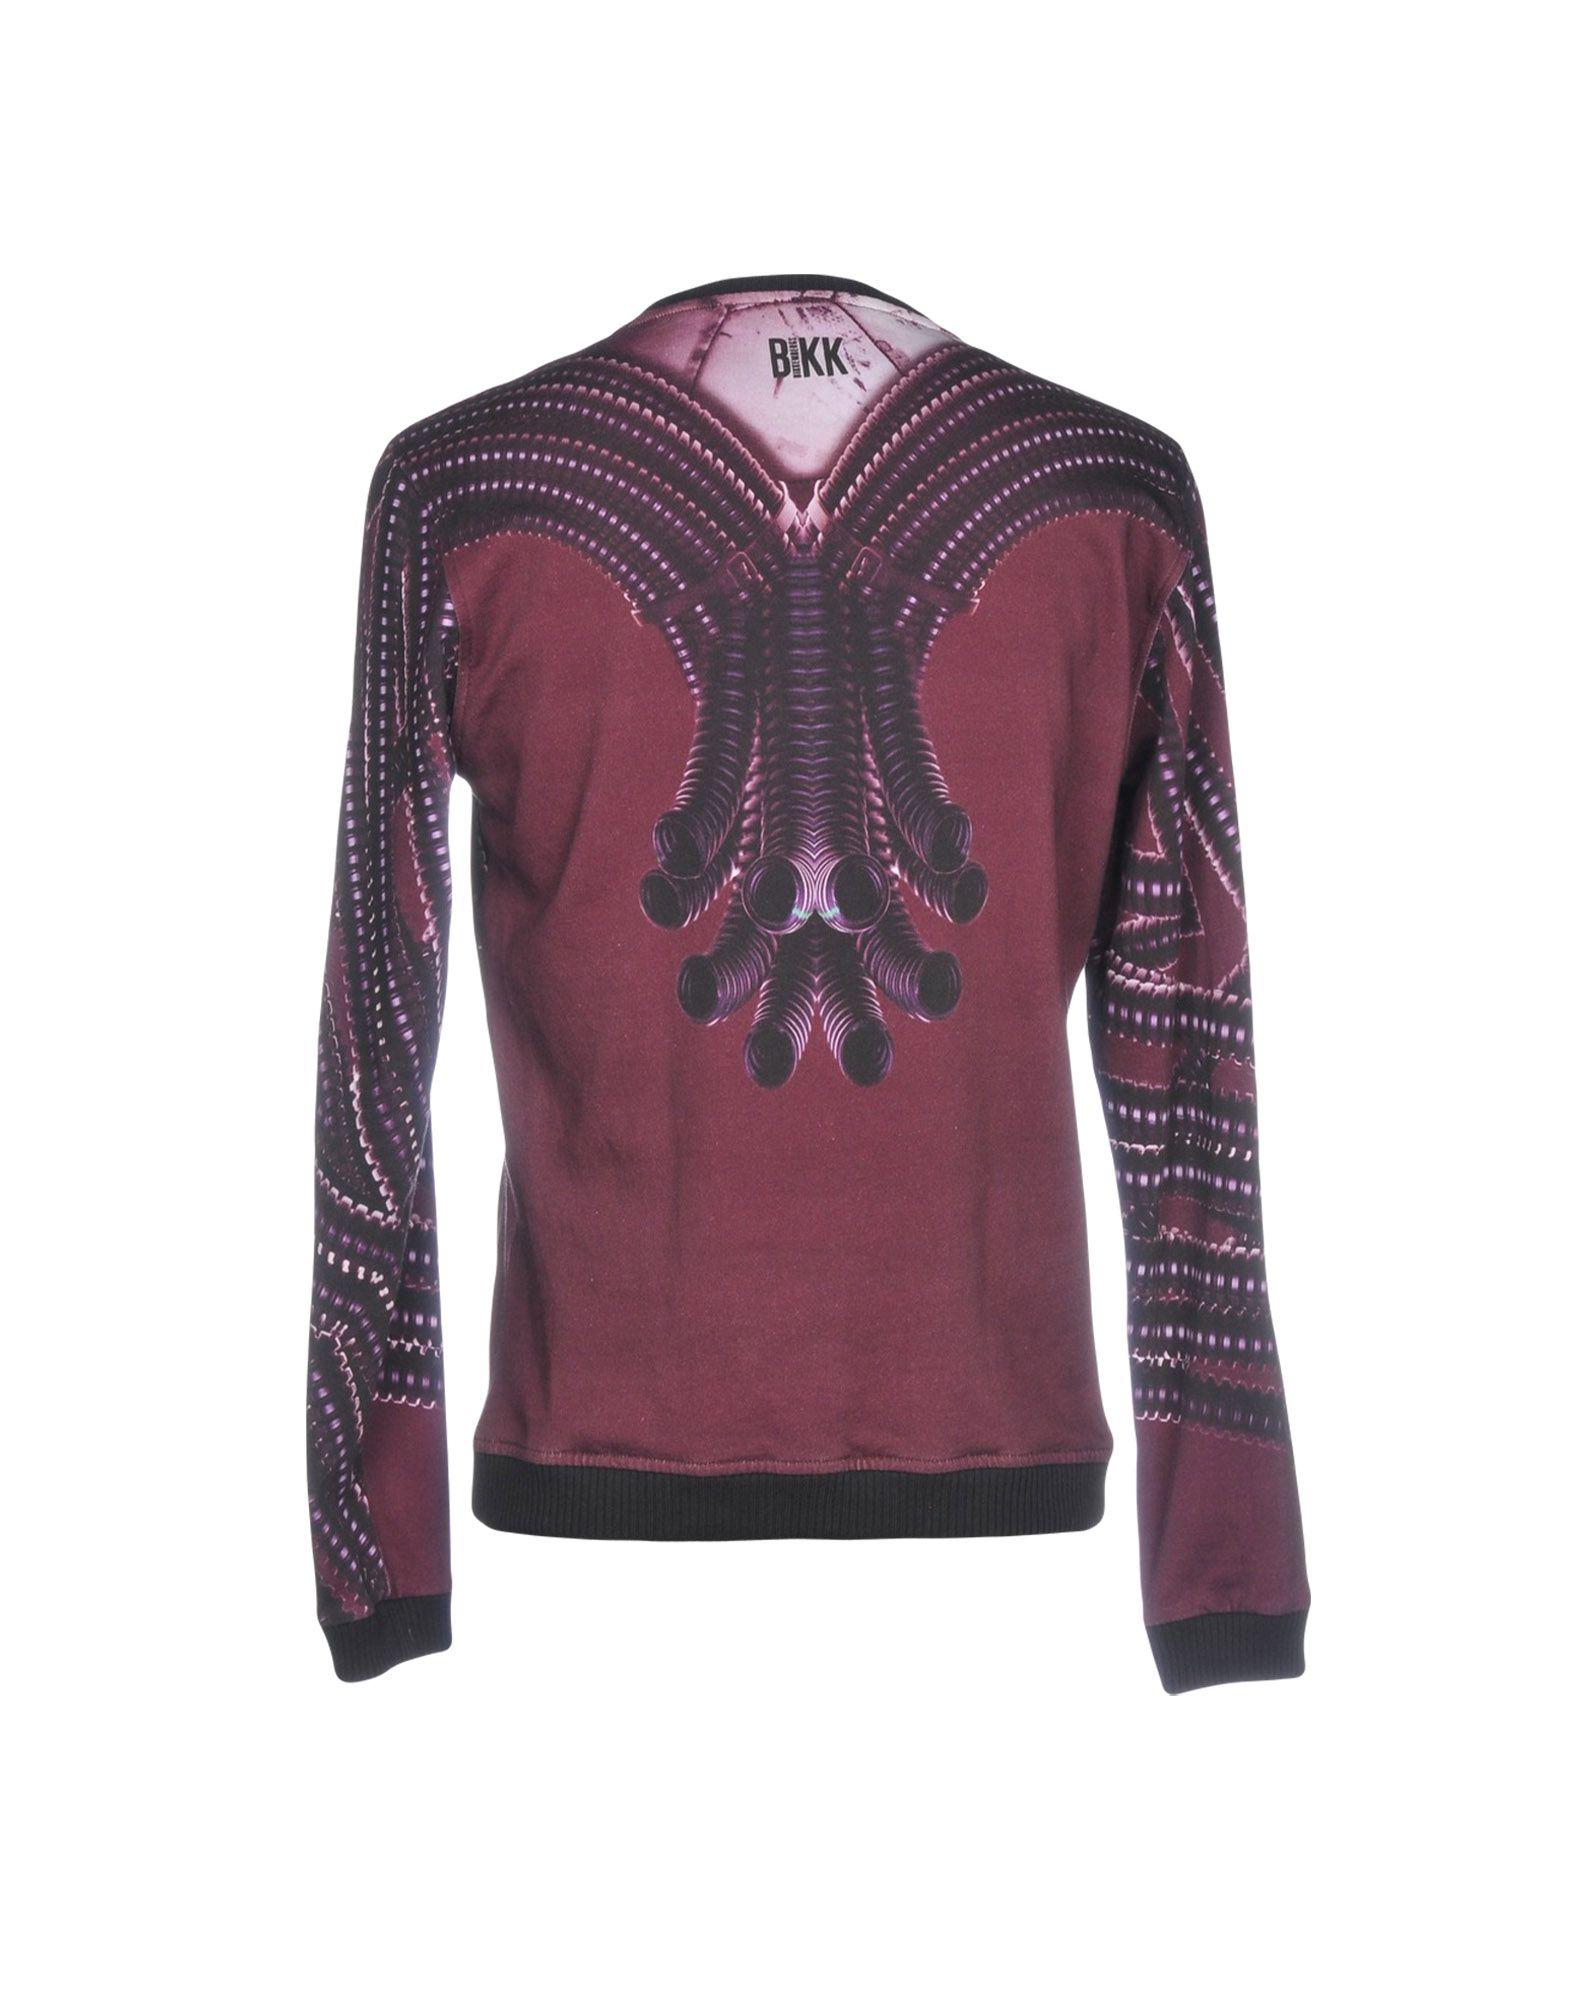 A buon mercato A buon mercato T-Shirt Bikkembergs Uomo 37885041AB - 37885041AB Uomo f7fdf3